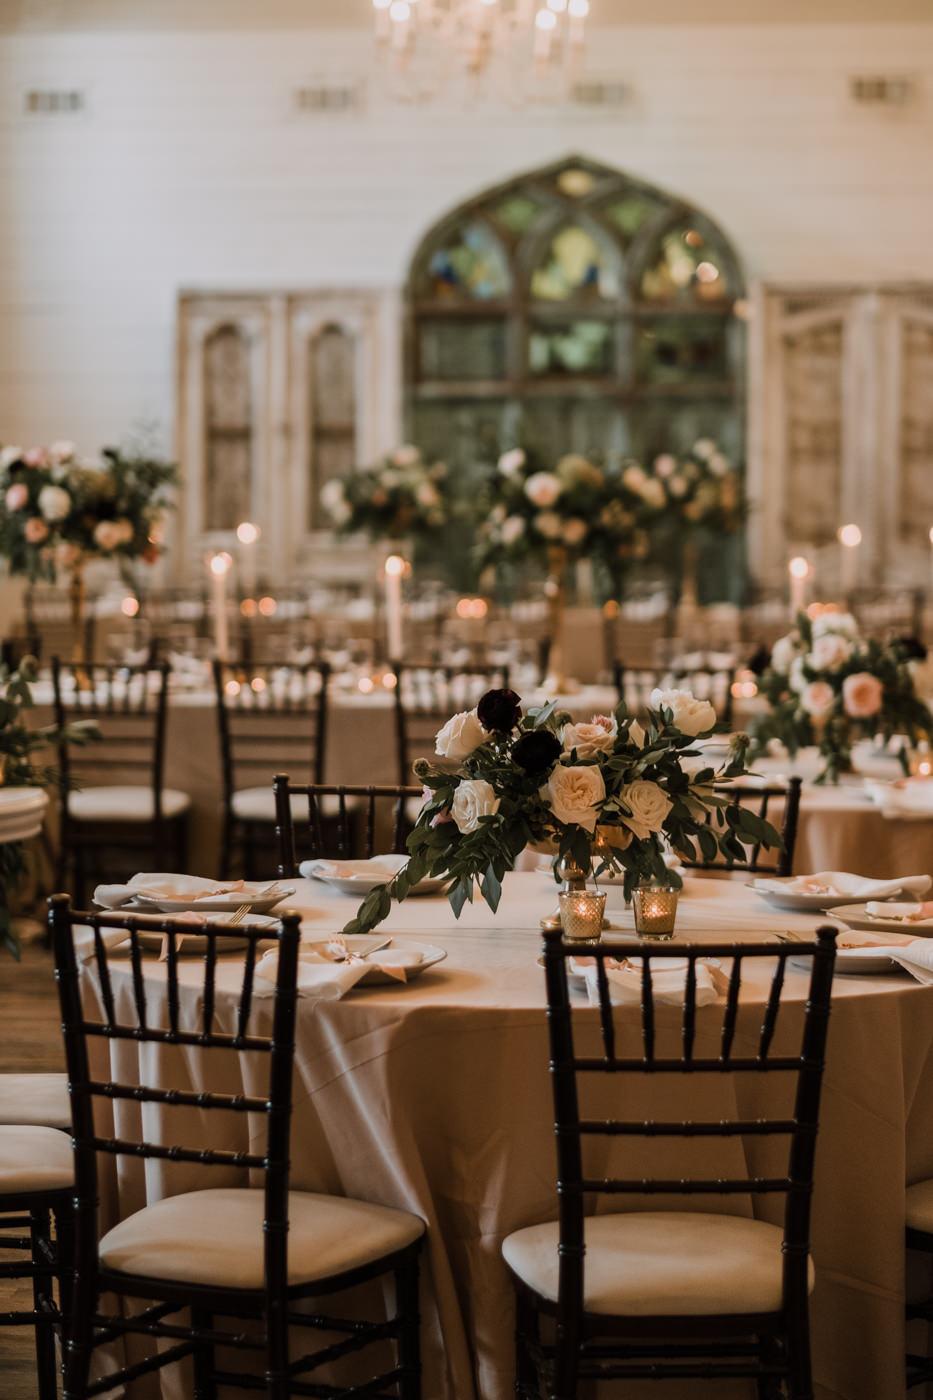 ravington.wedding.northwestarkansas.mileswittboyer-6.jpg